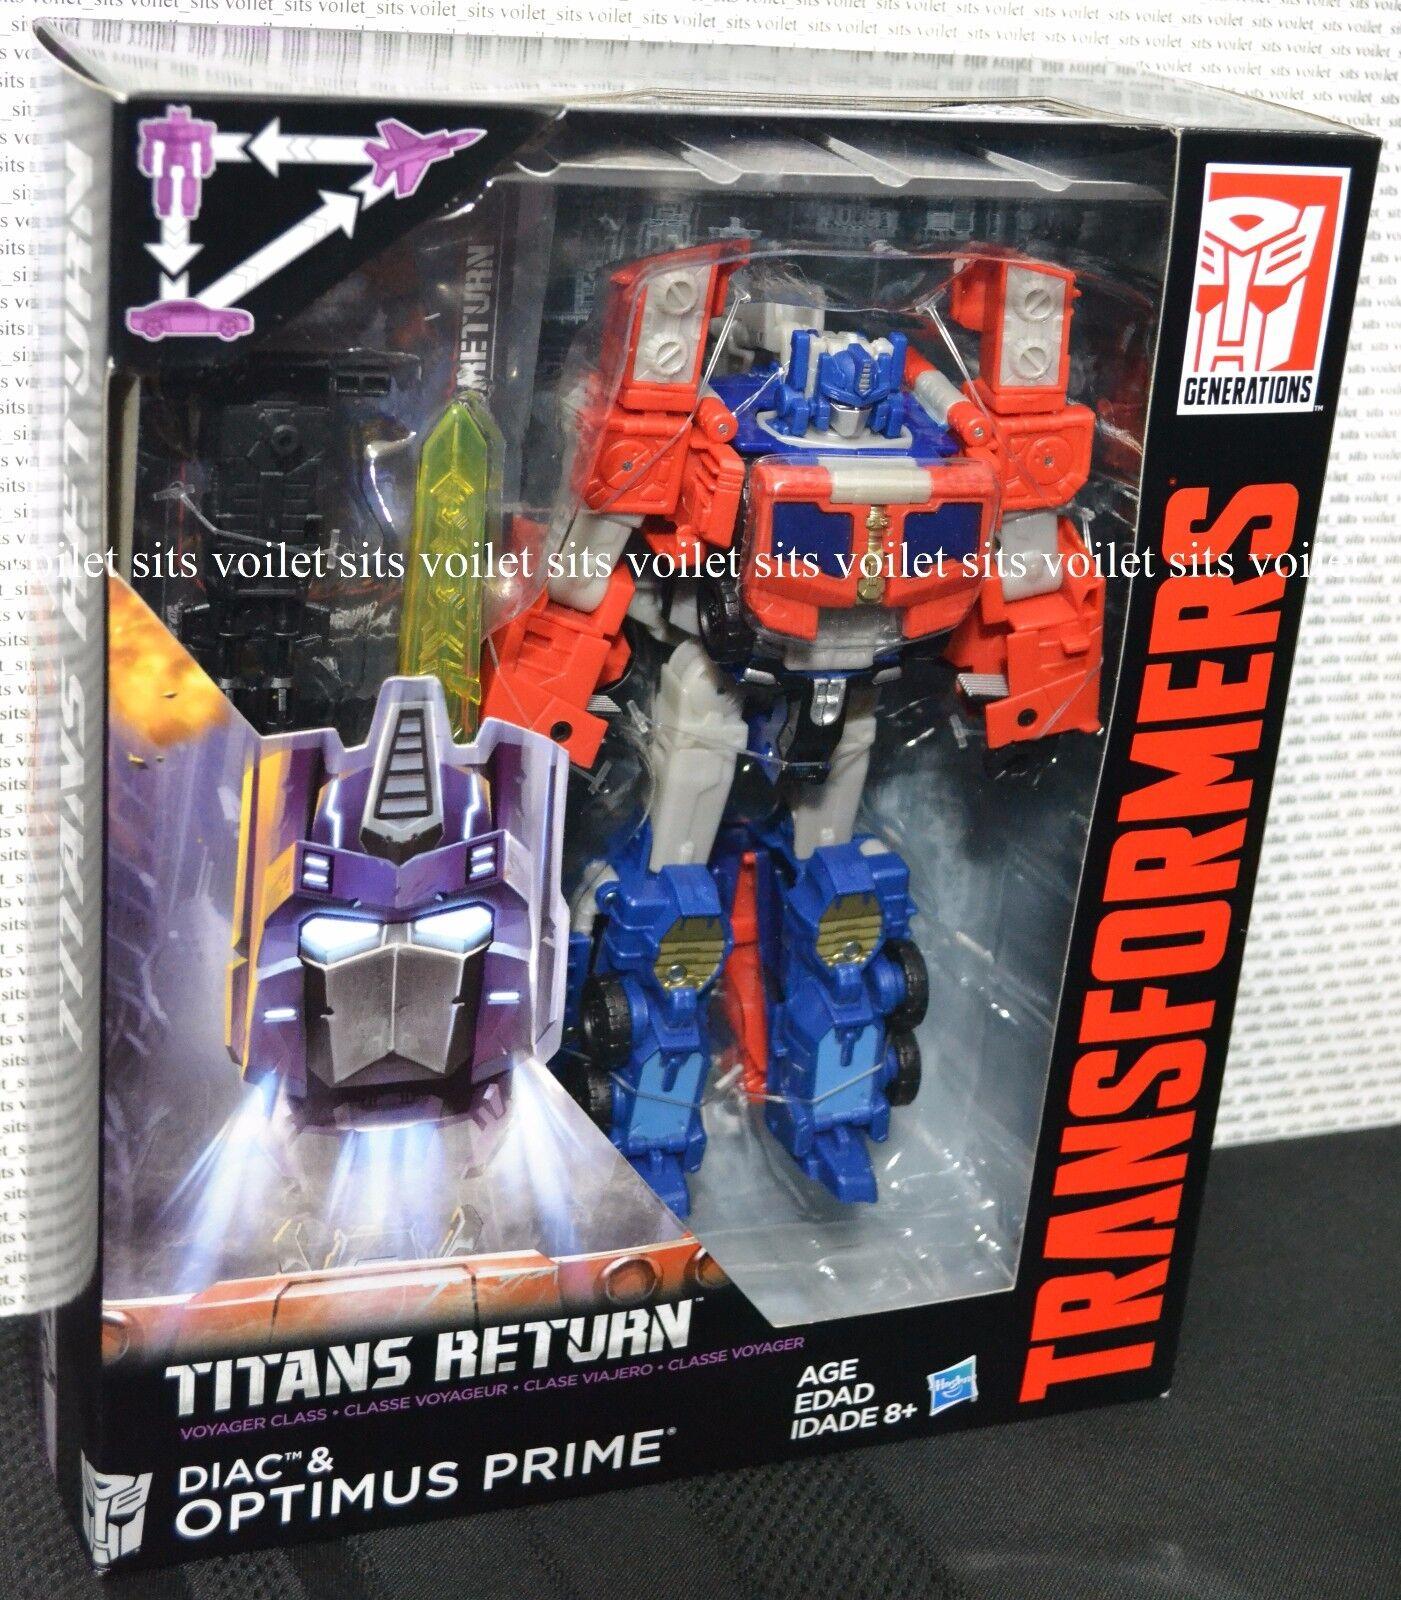 Transformers Generations Titans Return Voyager Class Figure Optimus Prime & Diac